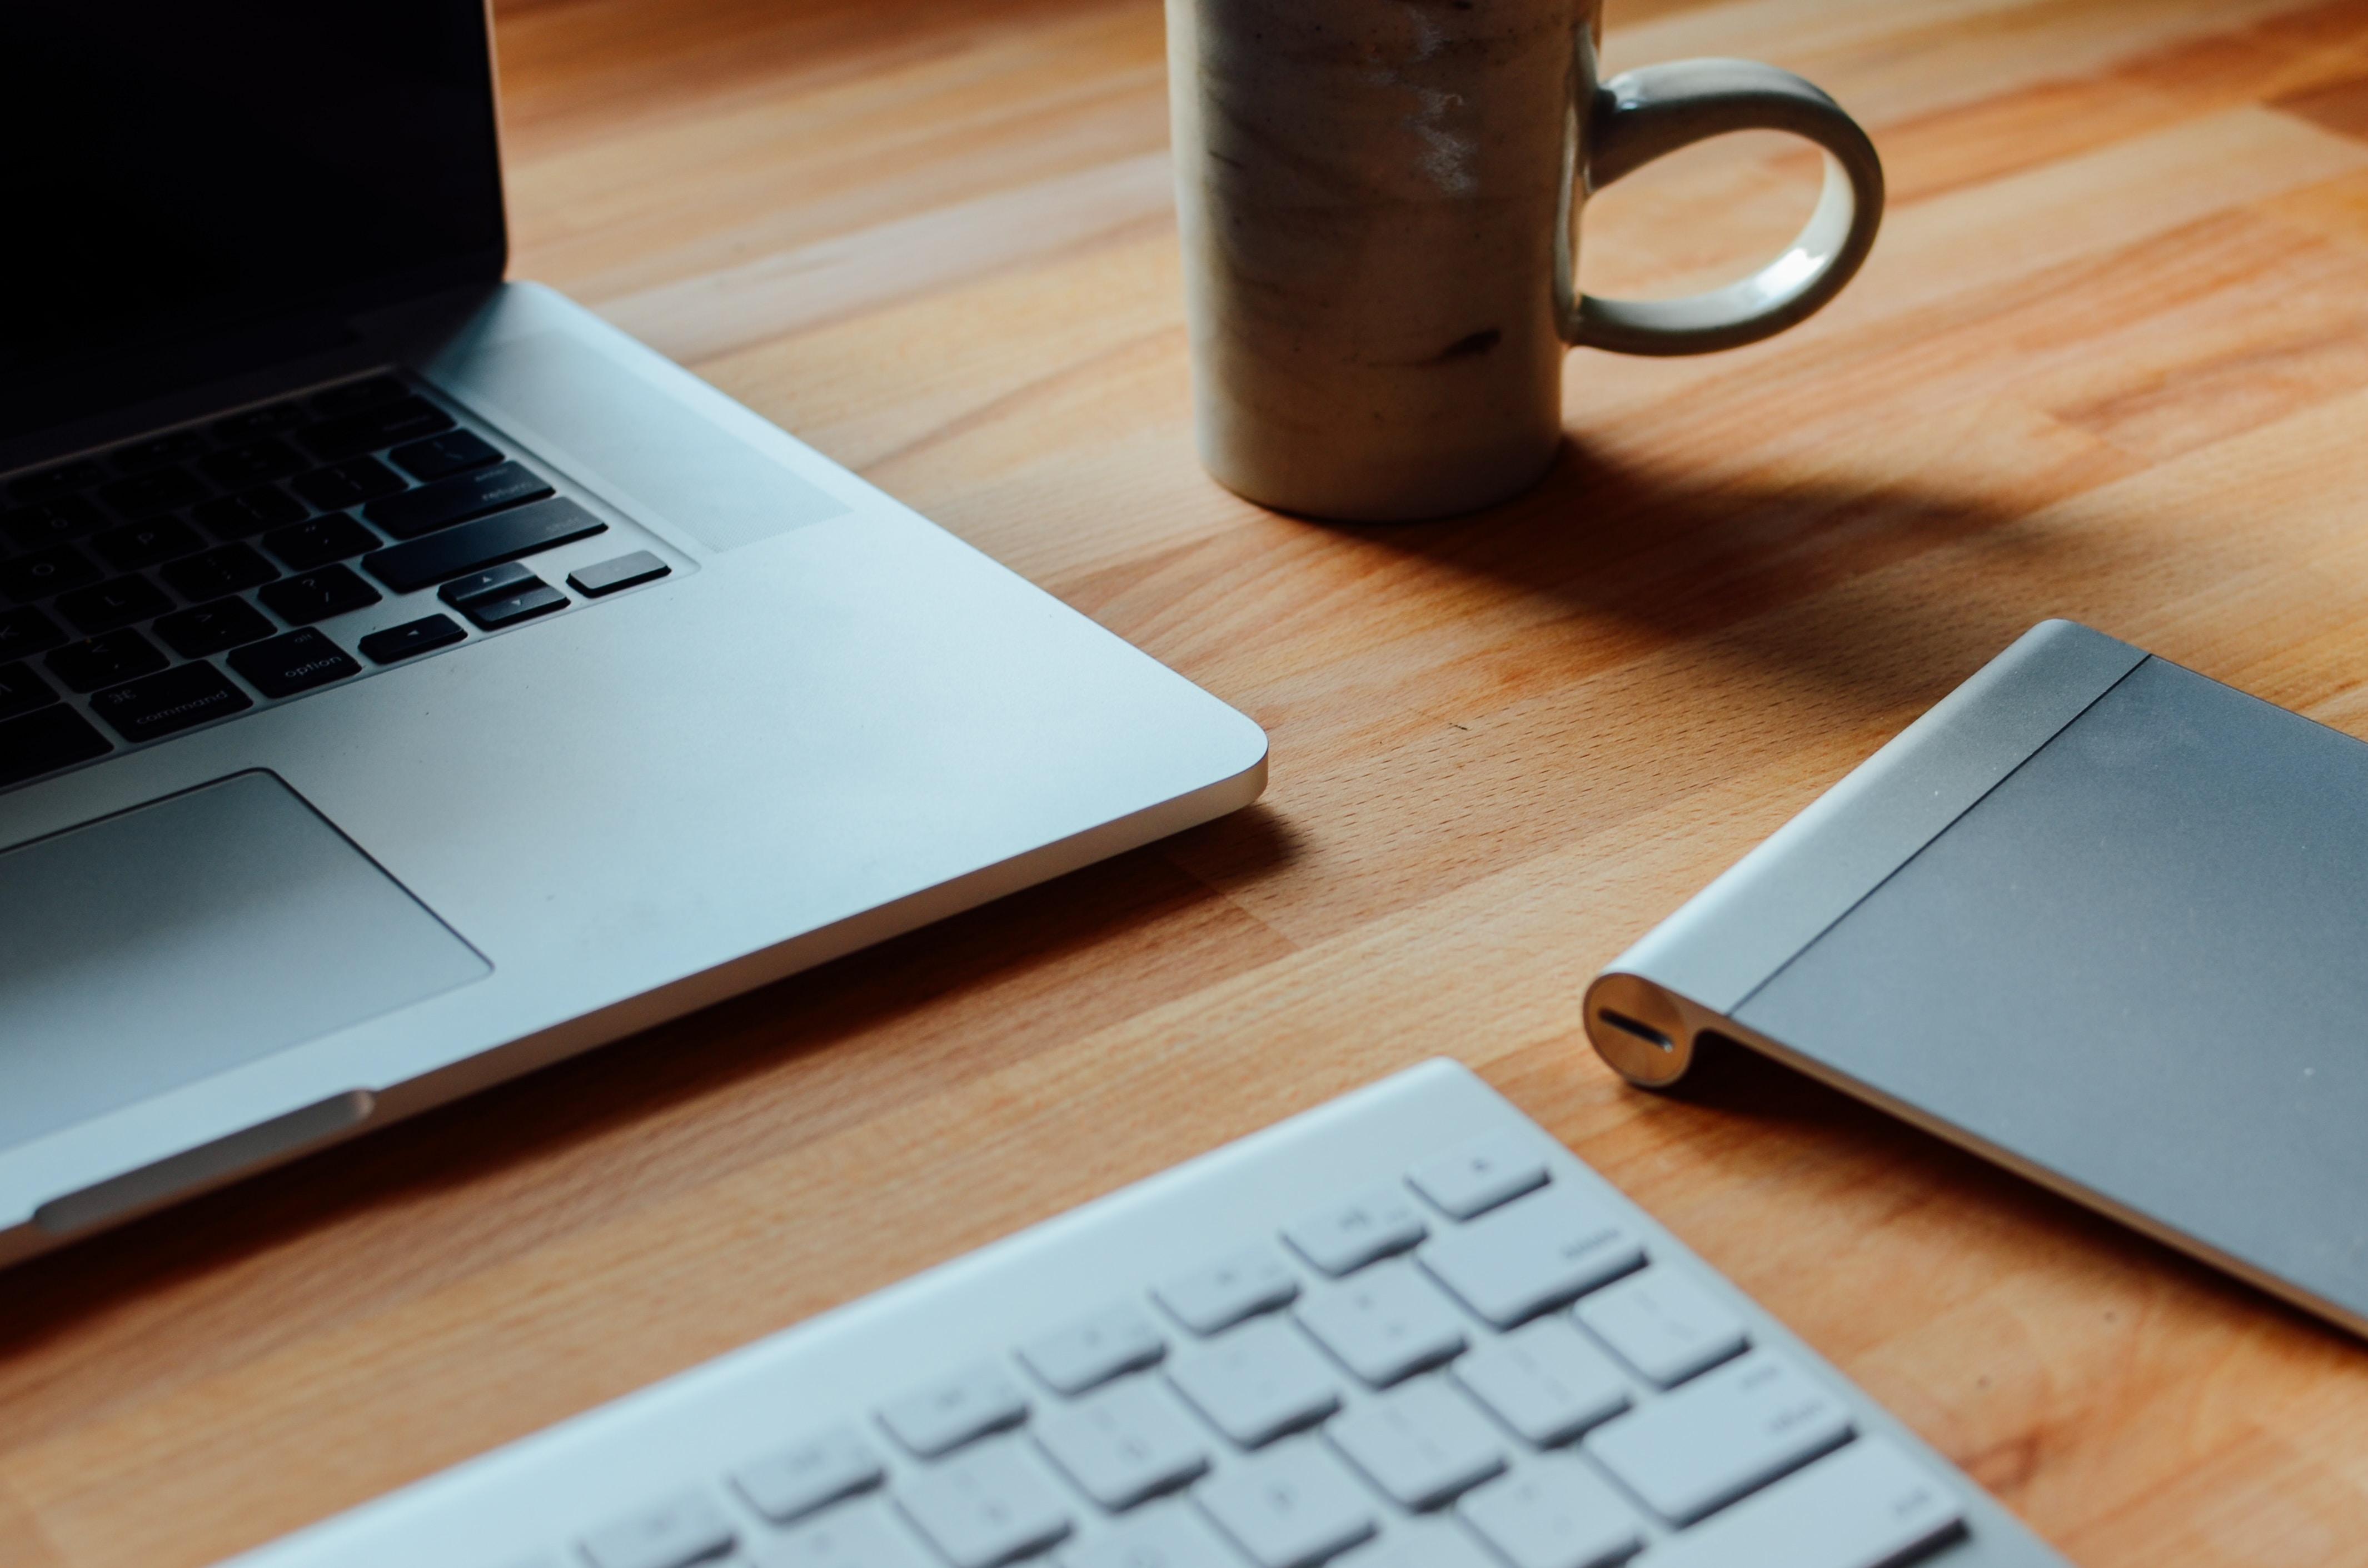 laptop office desk. Brilliant Laptop A Keyboard And A Mug Next To Laptop On Wooden Surface Inside Laptop Office Desk P